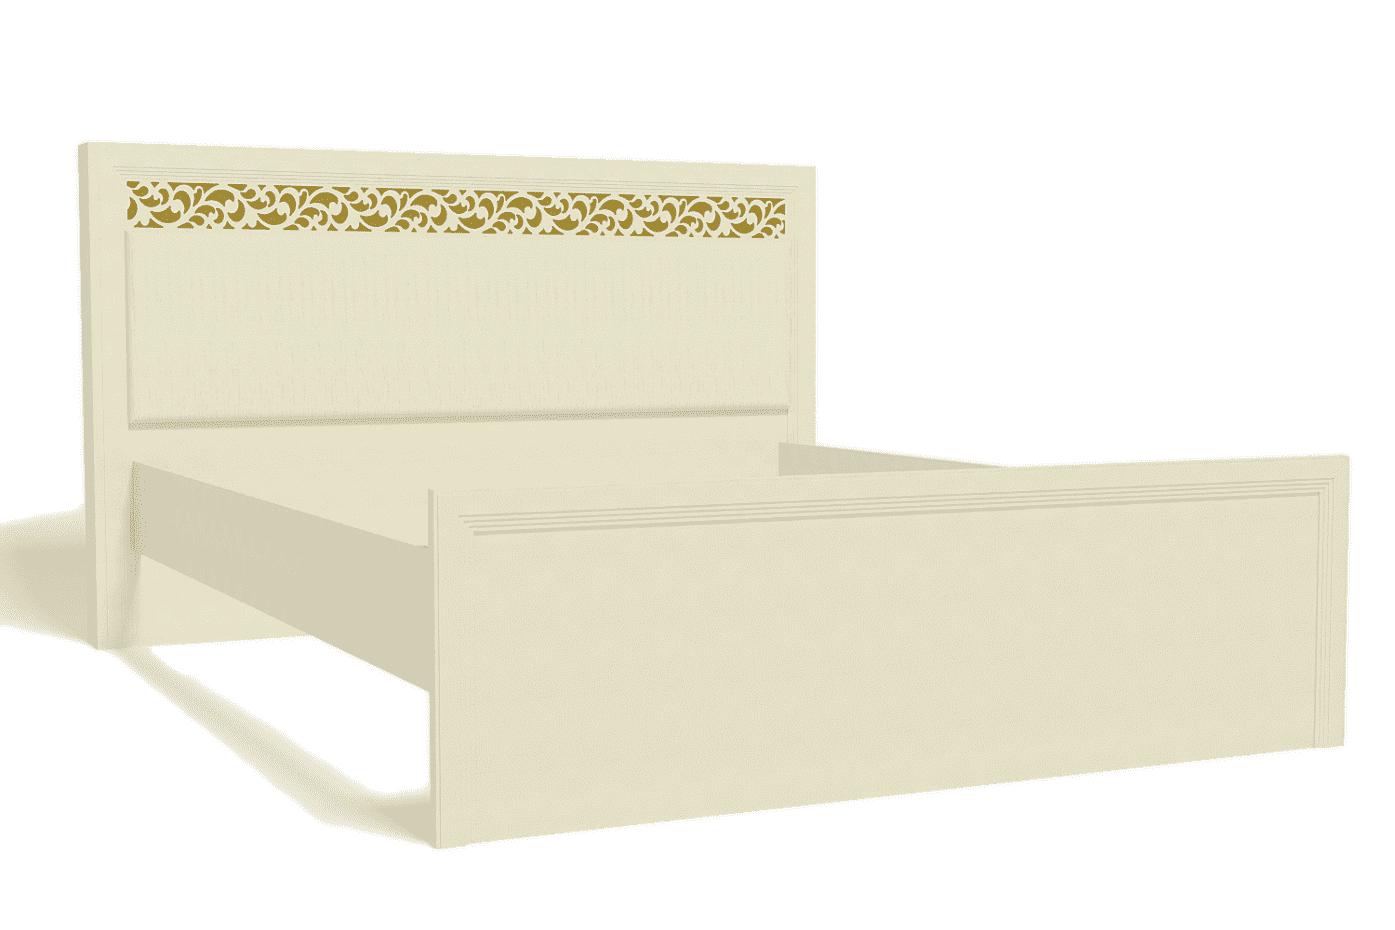 Спальня Ливадия Комплект 3 - фото Кровать 160*200 см без ортопеда, без матраса Ливадия Л8